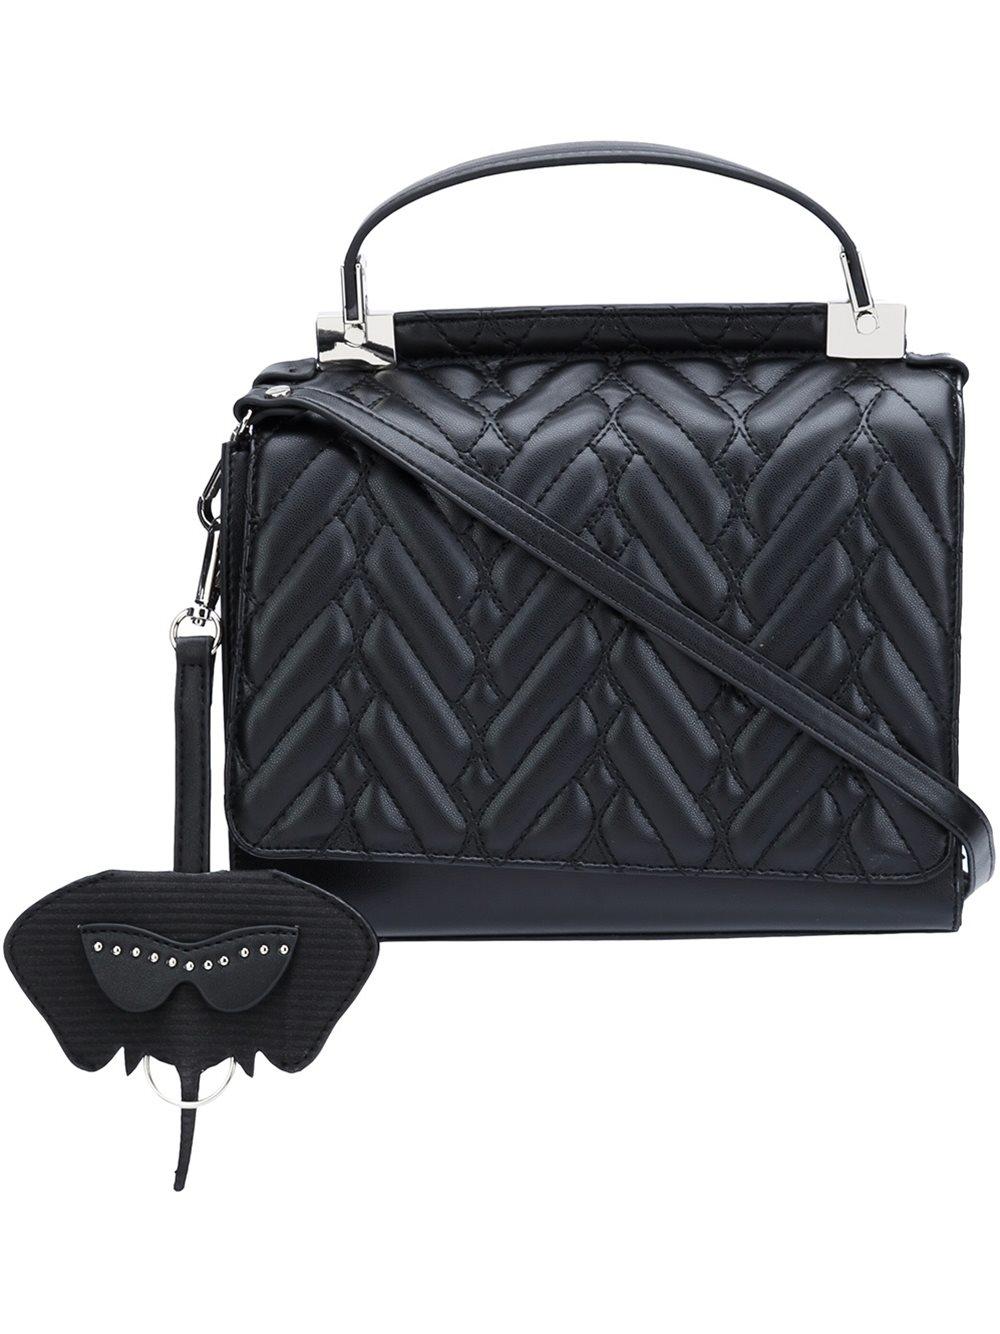 Lyst Christian Siriano Cate Crossbody Bag In Black